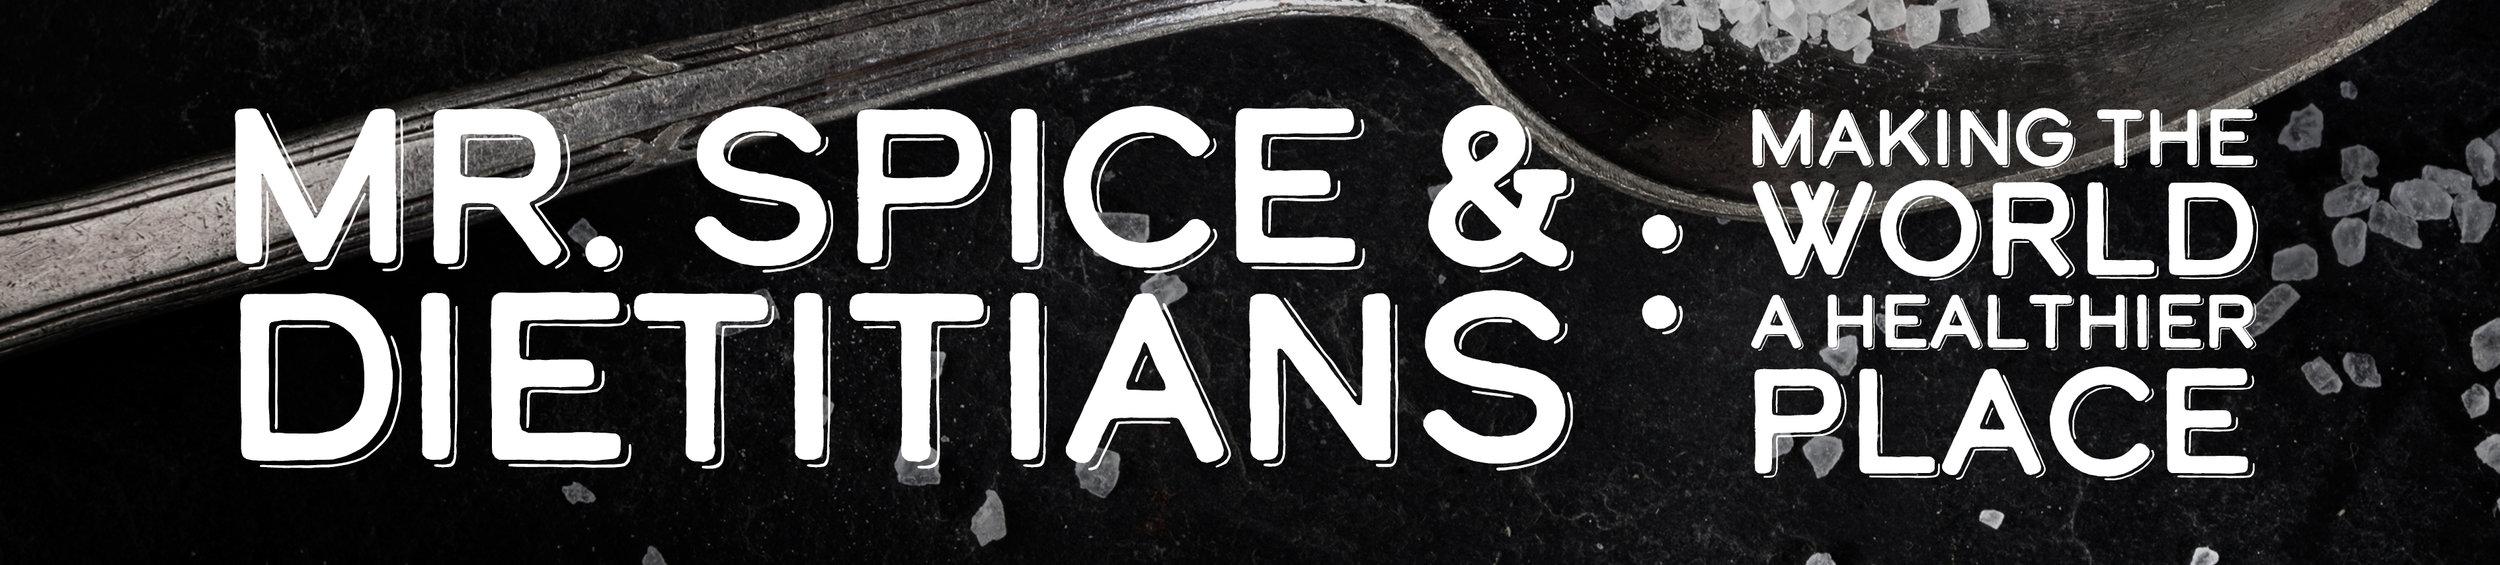 Mr. Spice Sauce Dietitian Deal 2.jpg